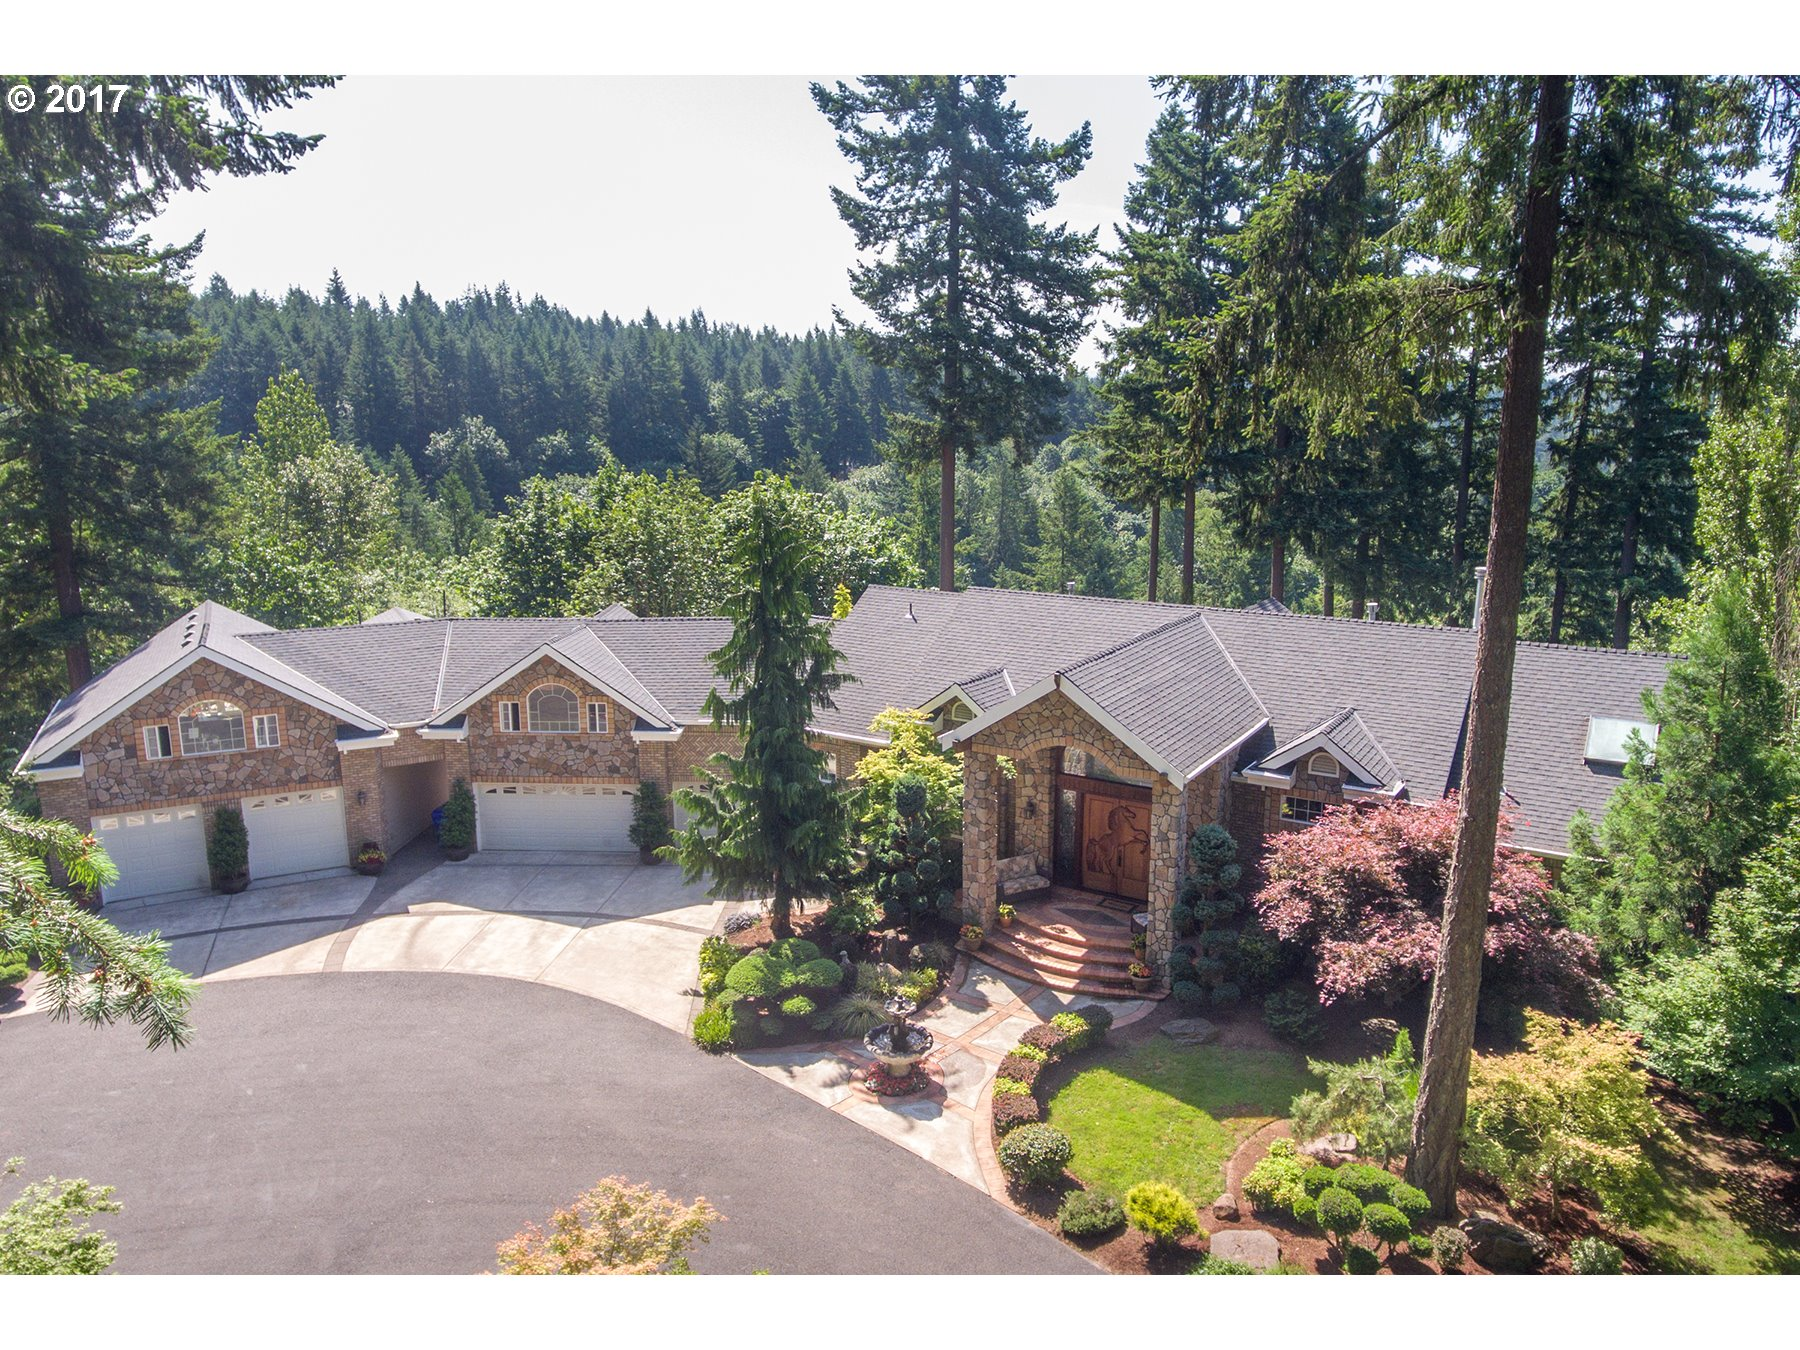 15622 S WILDFLOWER LN, Oregon City, OR 97045